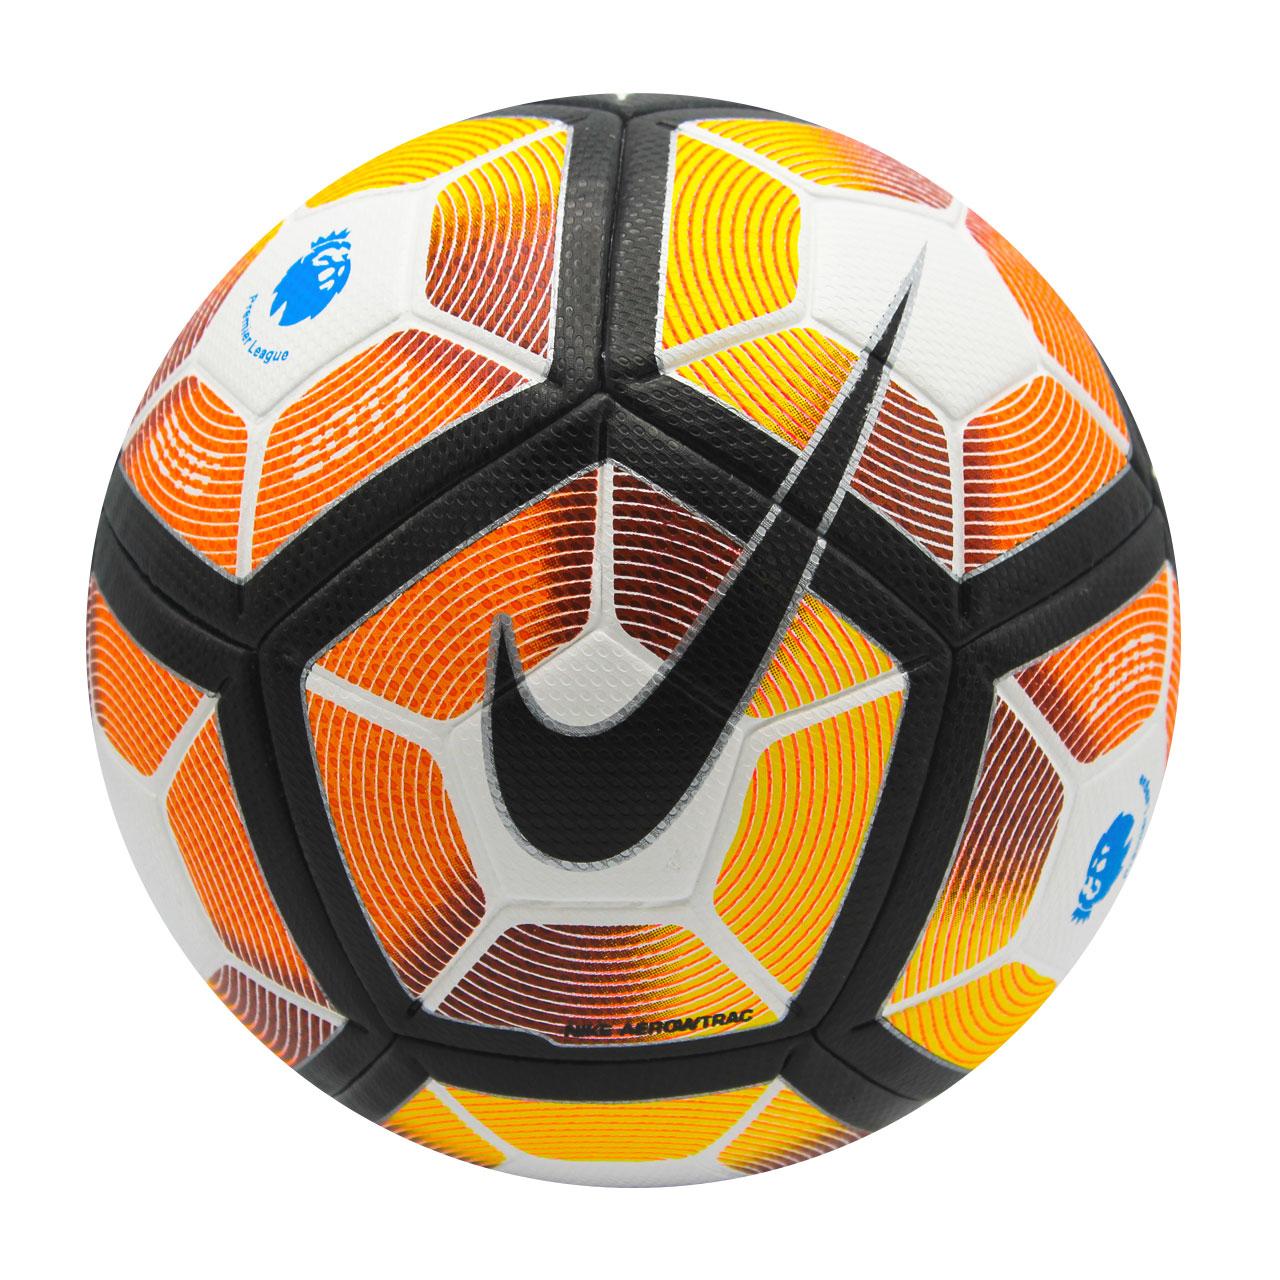 خرید                      توپ فوتبال نایکی مدل premier league